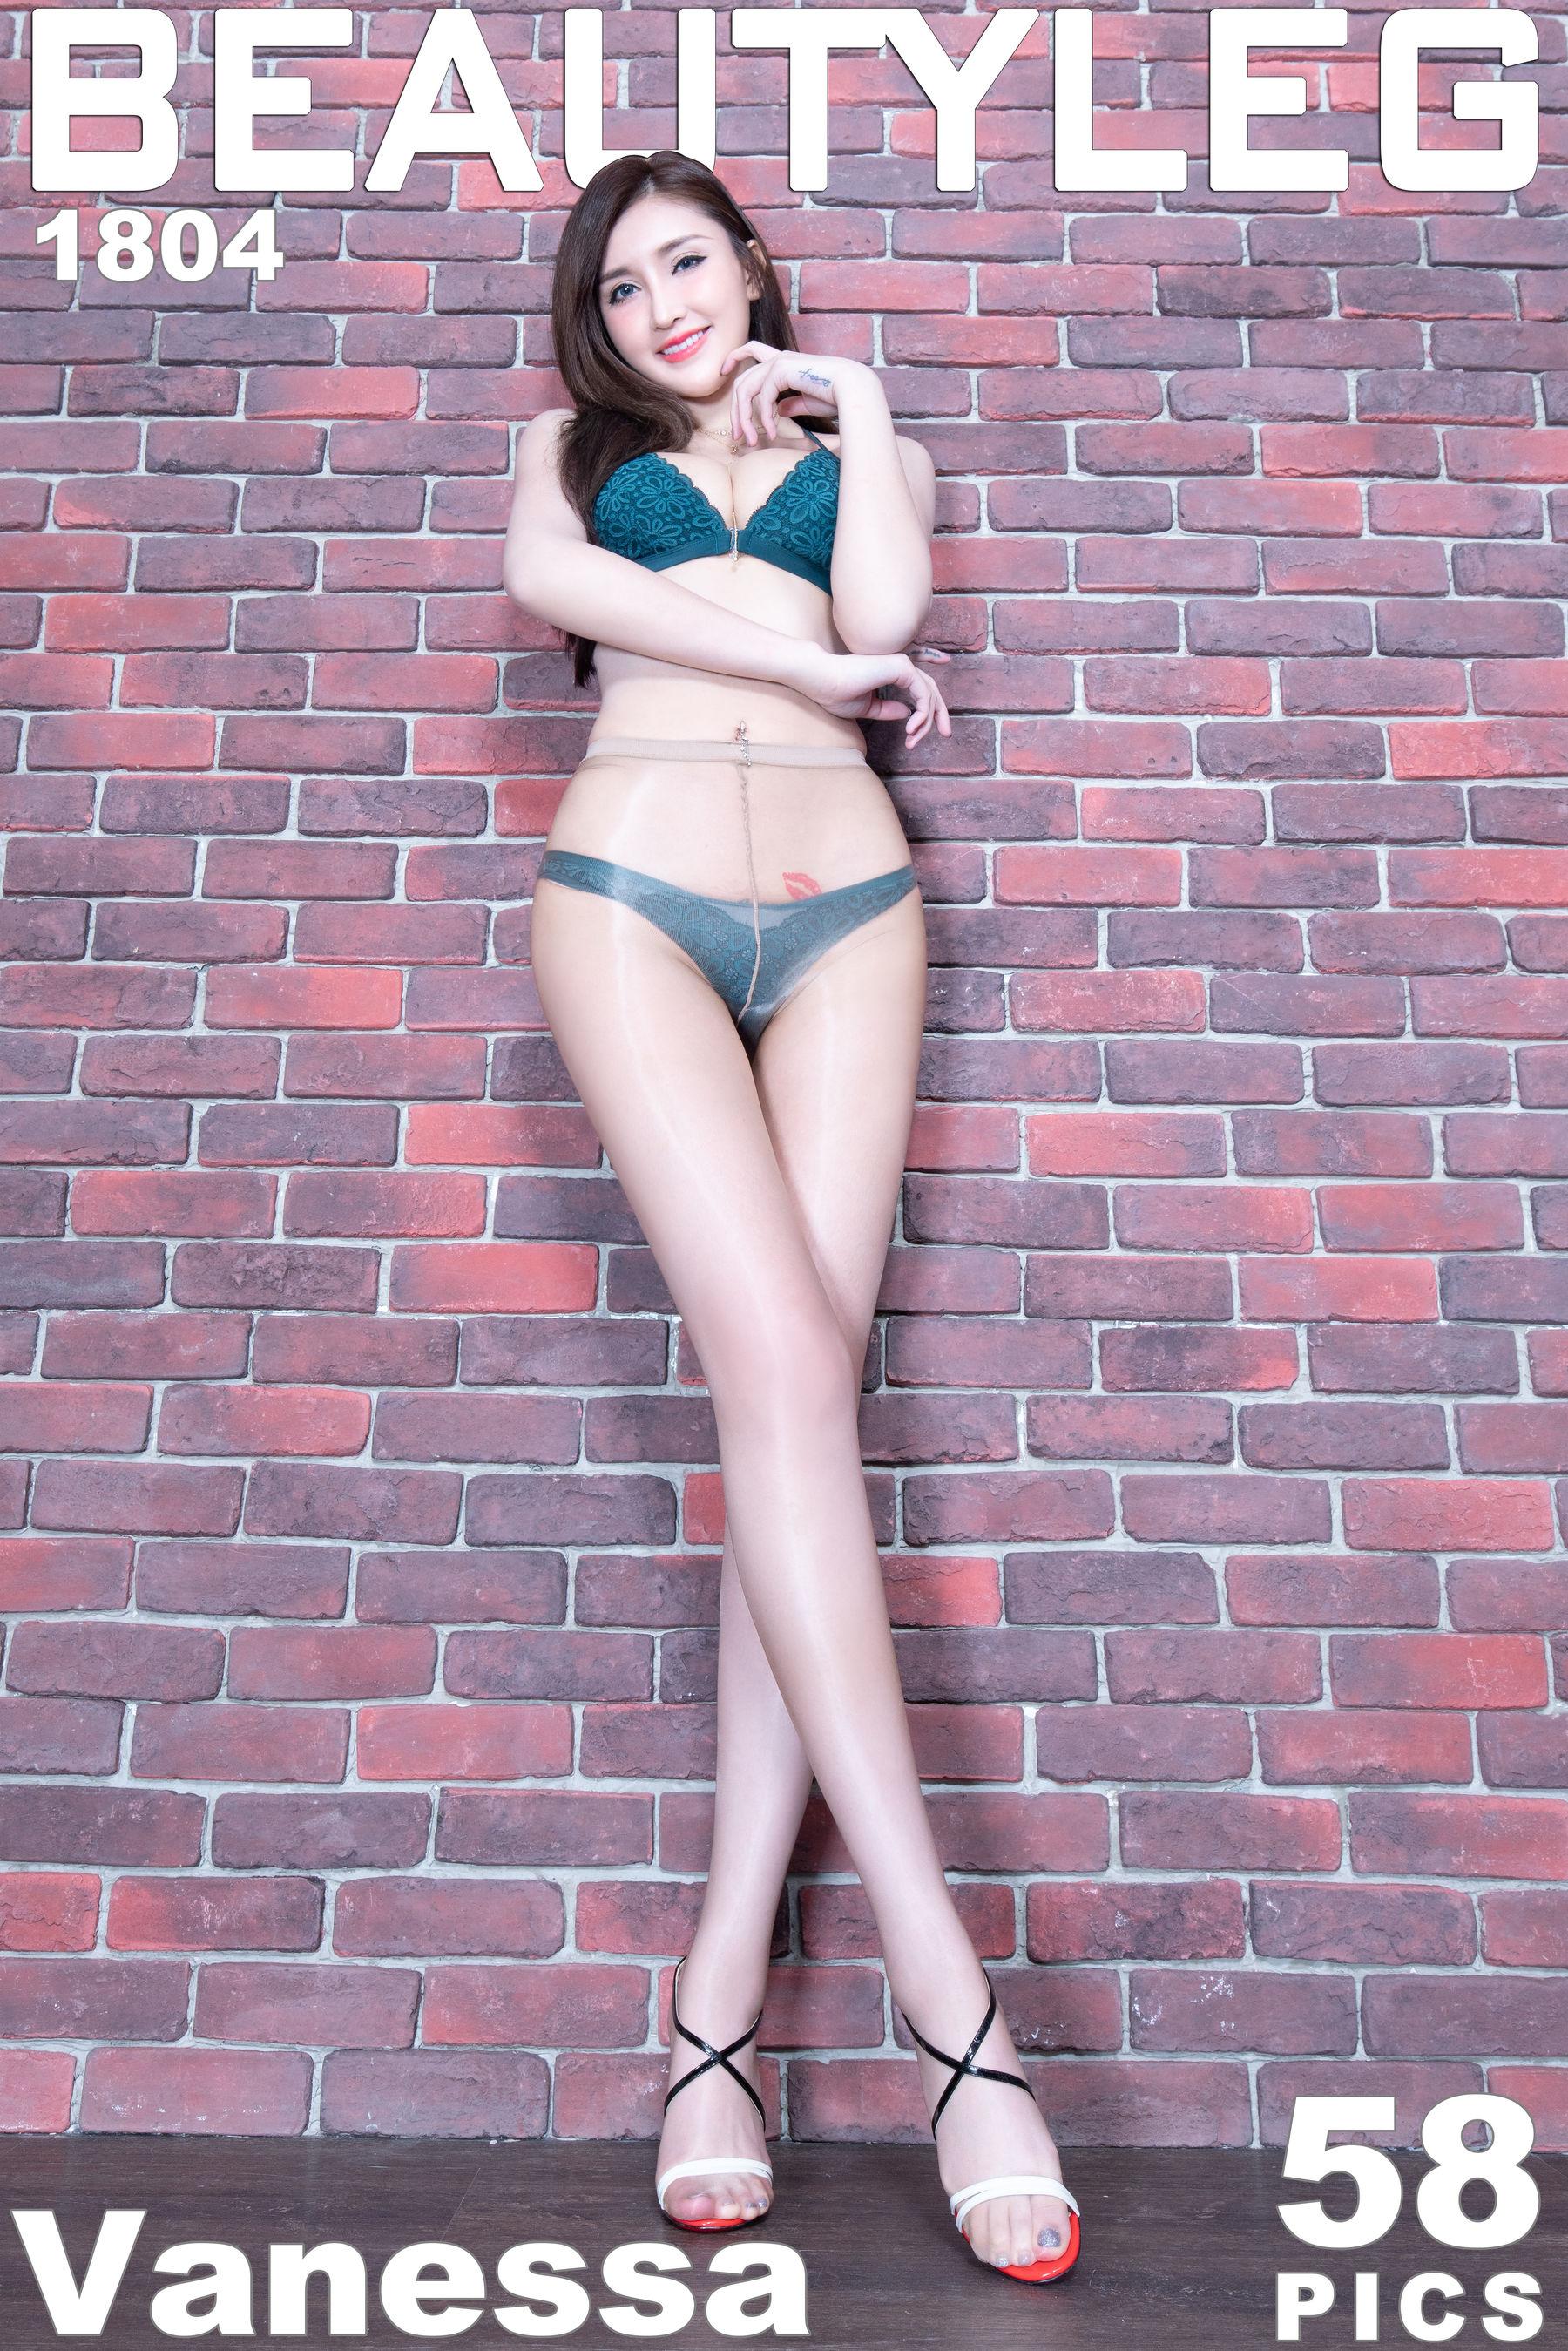 VOL.145 [Beautyleg]泳装美腿:任育萱(腿模Vanessa)超高清个人性感漂亮大图(51P)